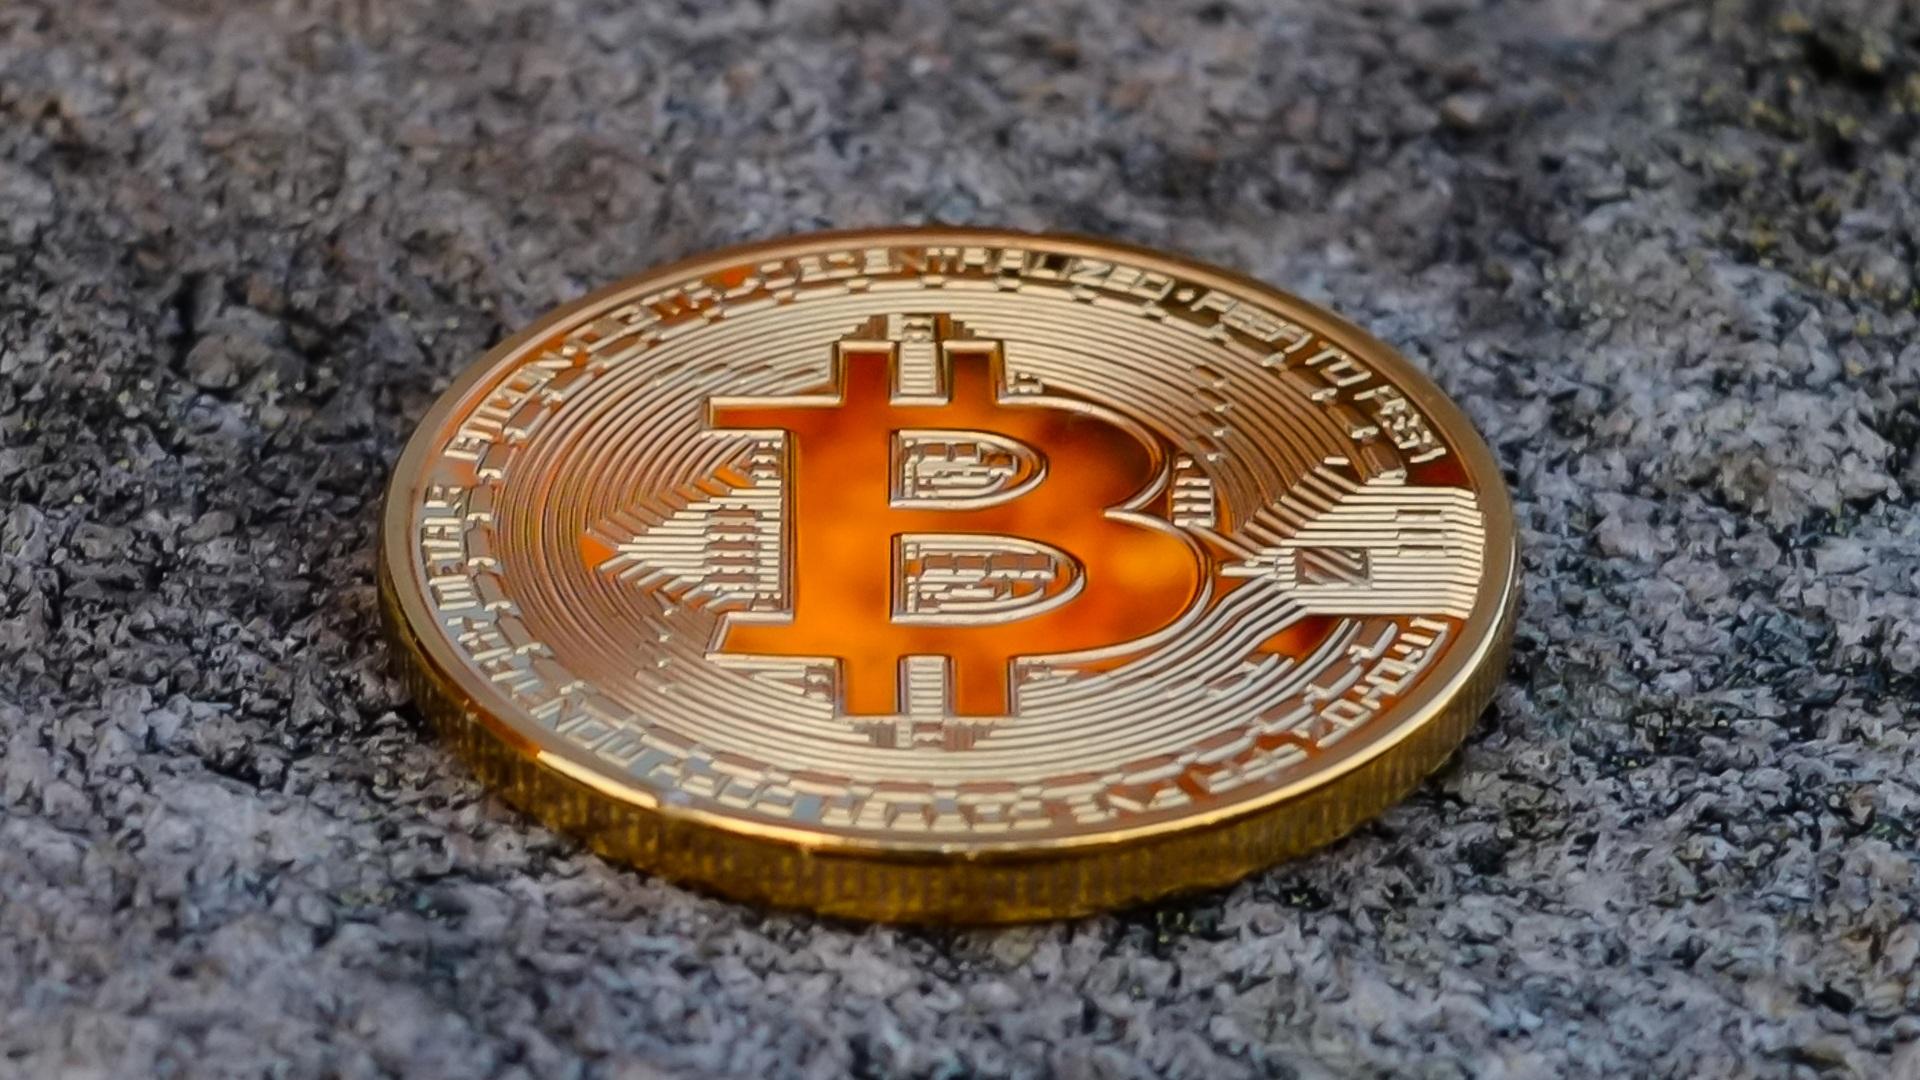 Bitcoin artwork